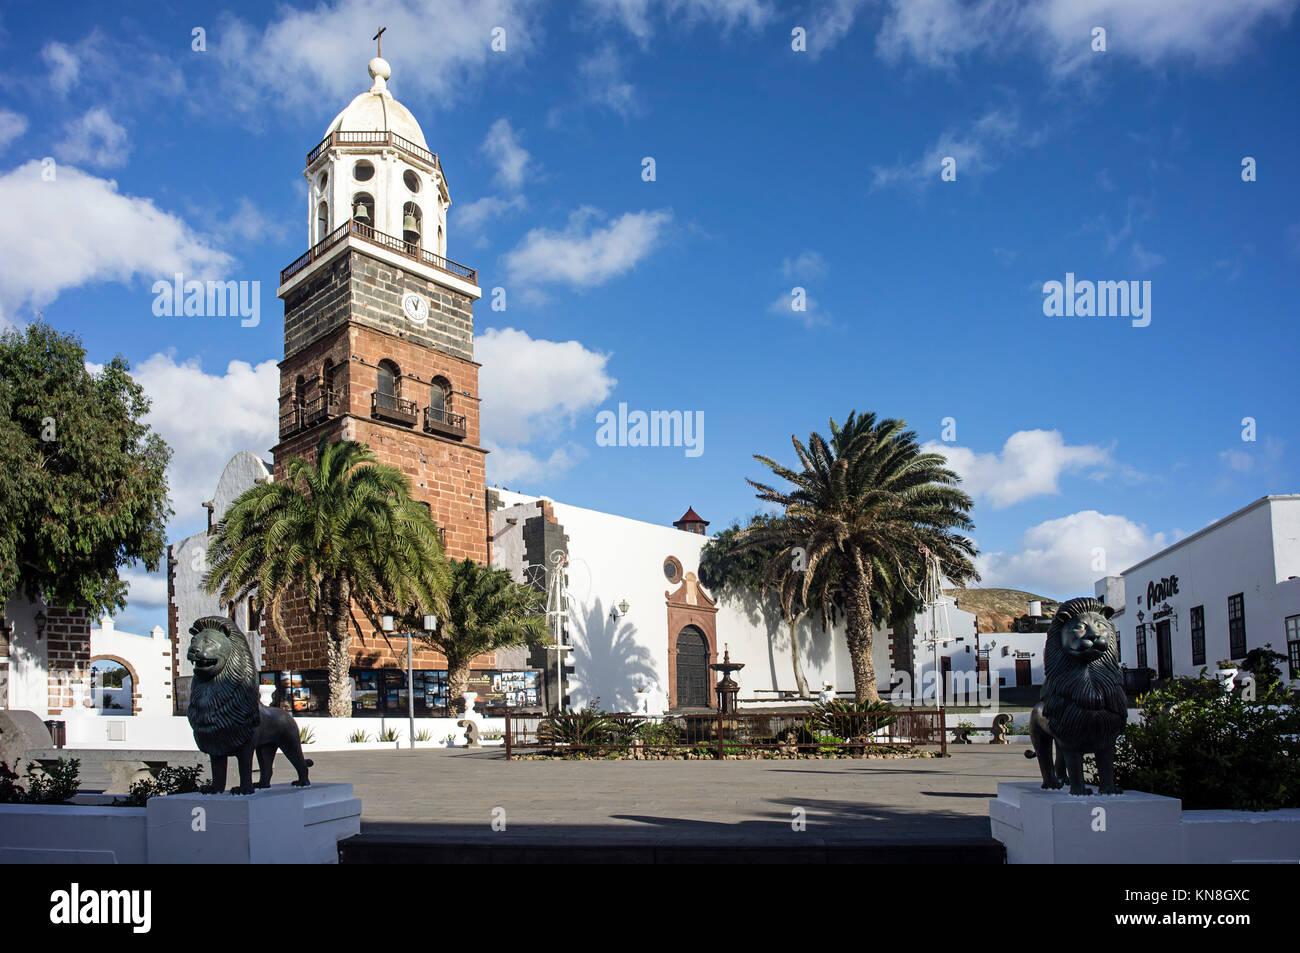 Nuestra Senora de Guadalupe church,   Teguise,   Lanzarote, Canary Islands, Spain - Stock Image